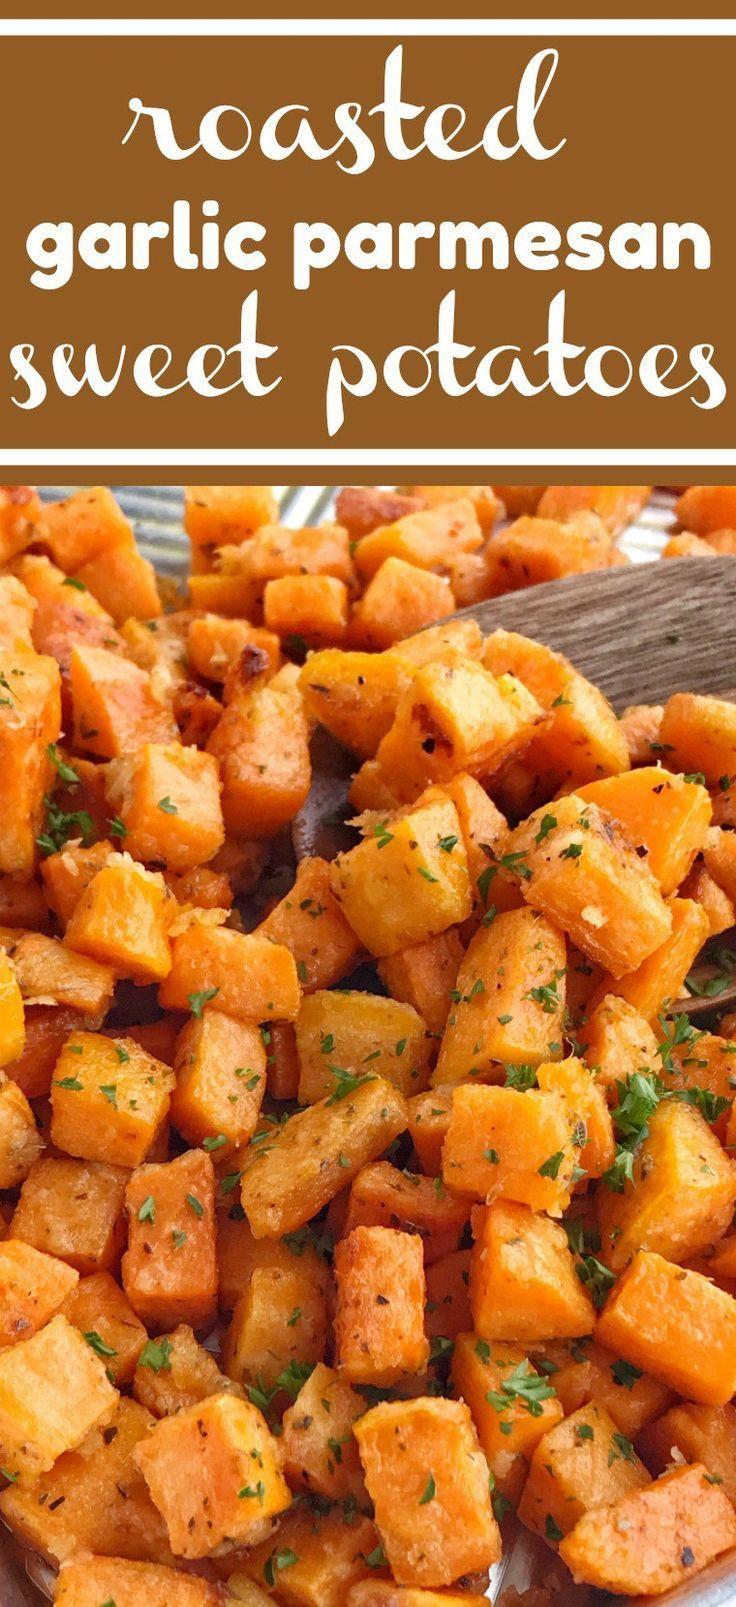 Roasted Garlic Parmesan Sweet Potaotes   Sweet Potatoes   Side Dish Recipes   Sw... -